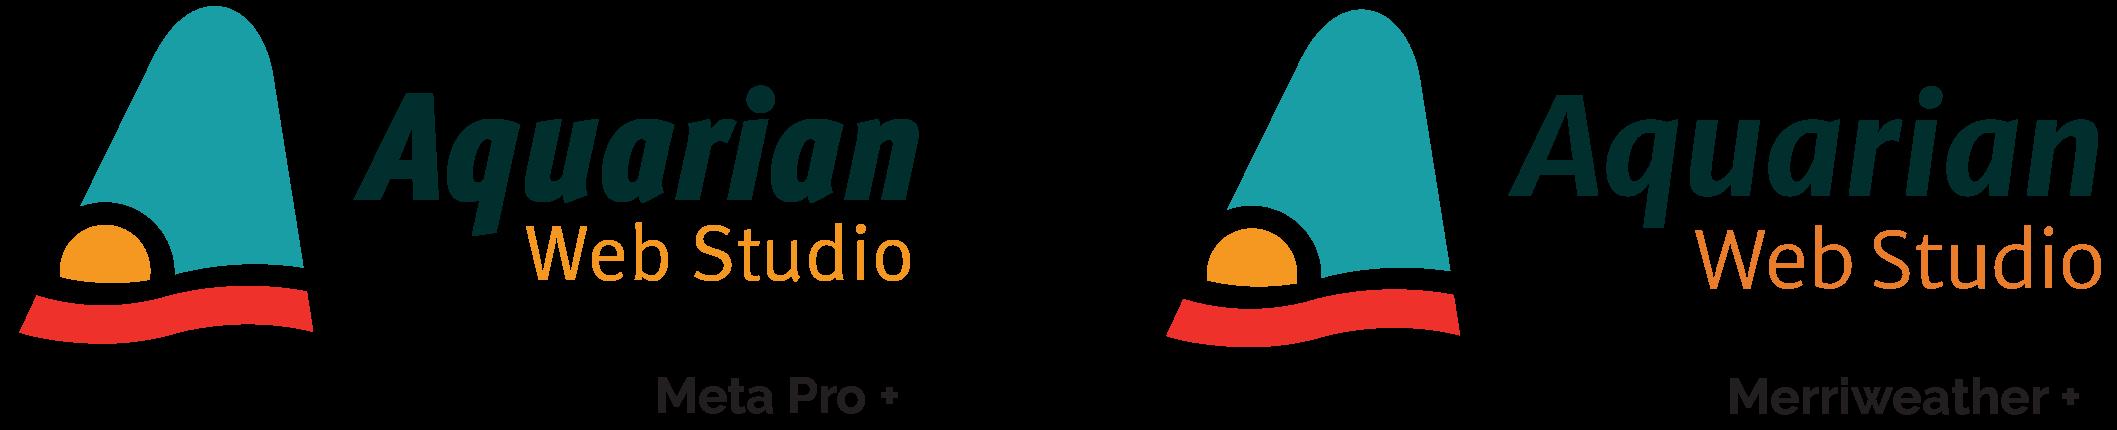 Logo versions in Meta Pro & Merriweather fonts